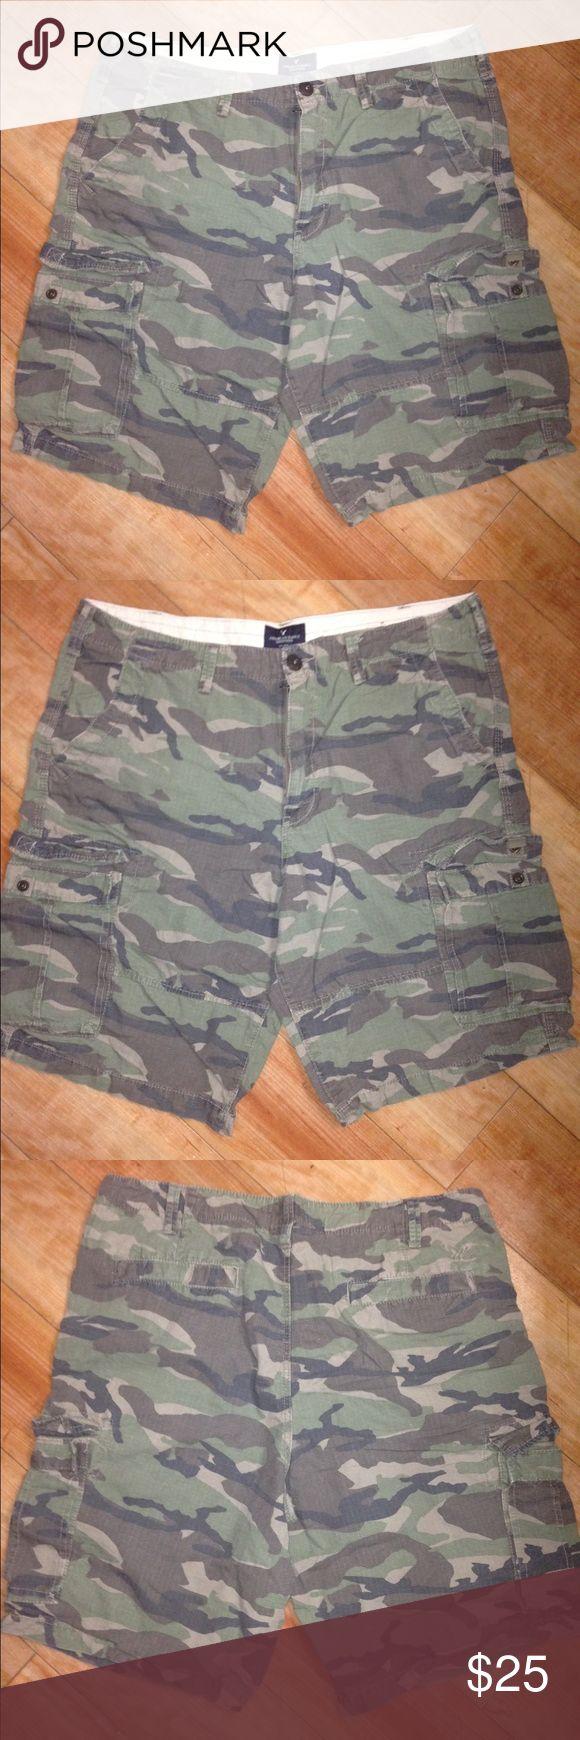 American eagle men's camo shorts longboard Camouflage. Longboard. Size 38. 100% cotton. American Eagle Outfitters Shorts